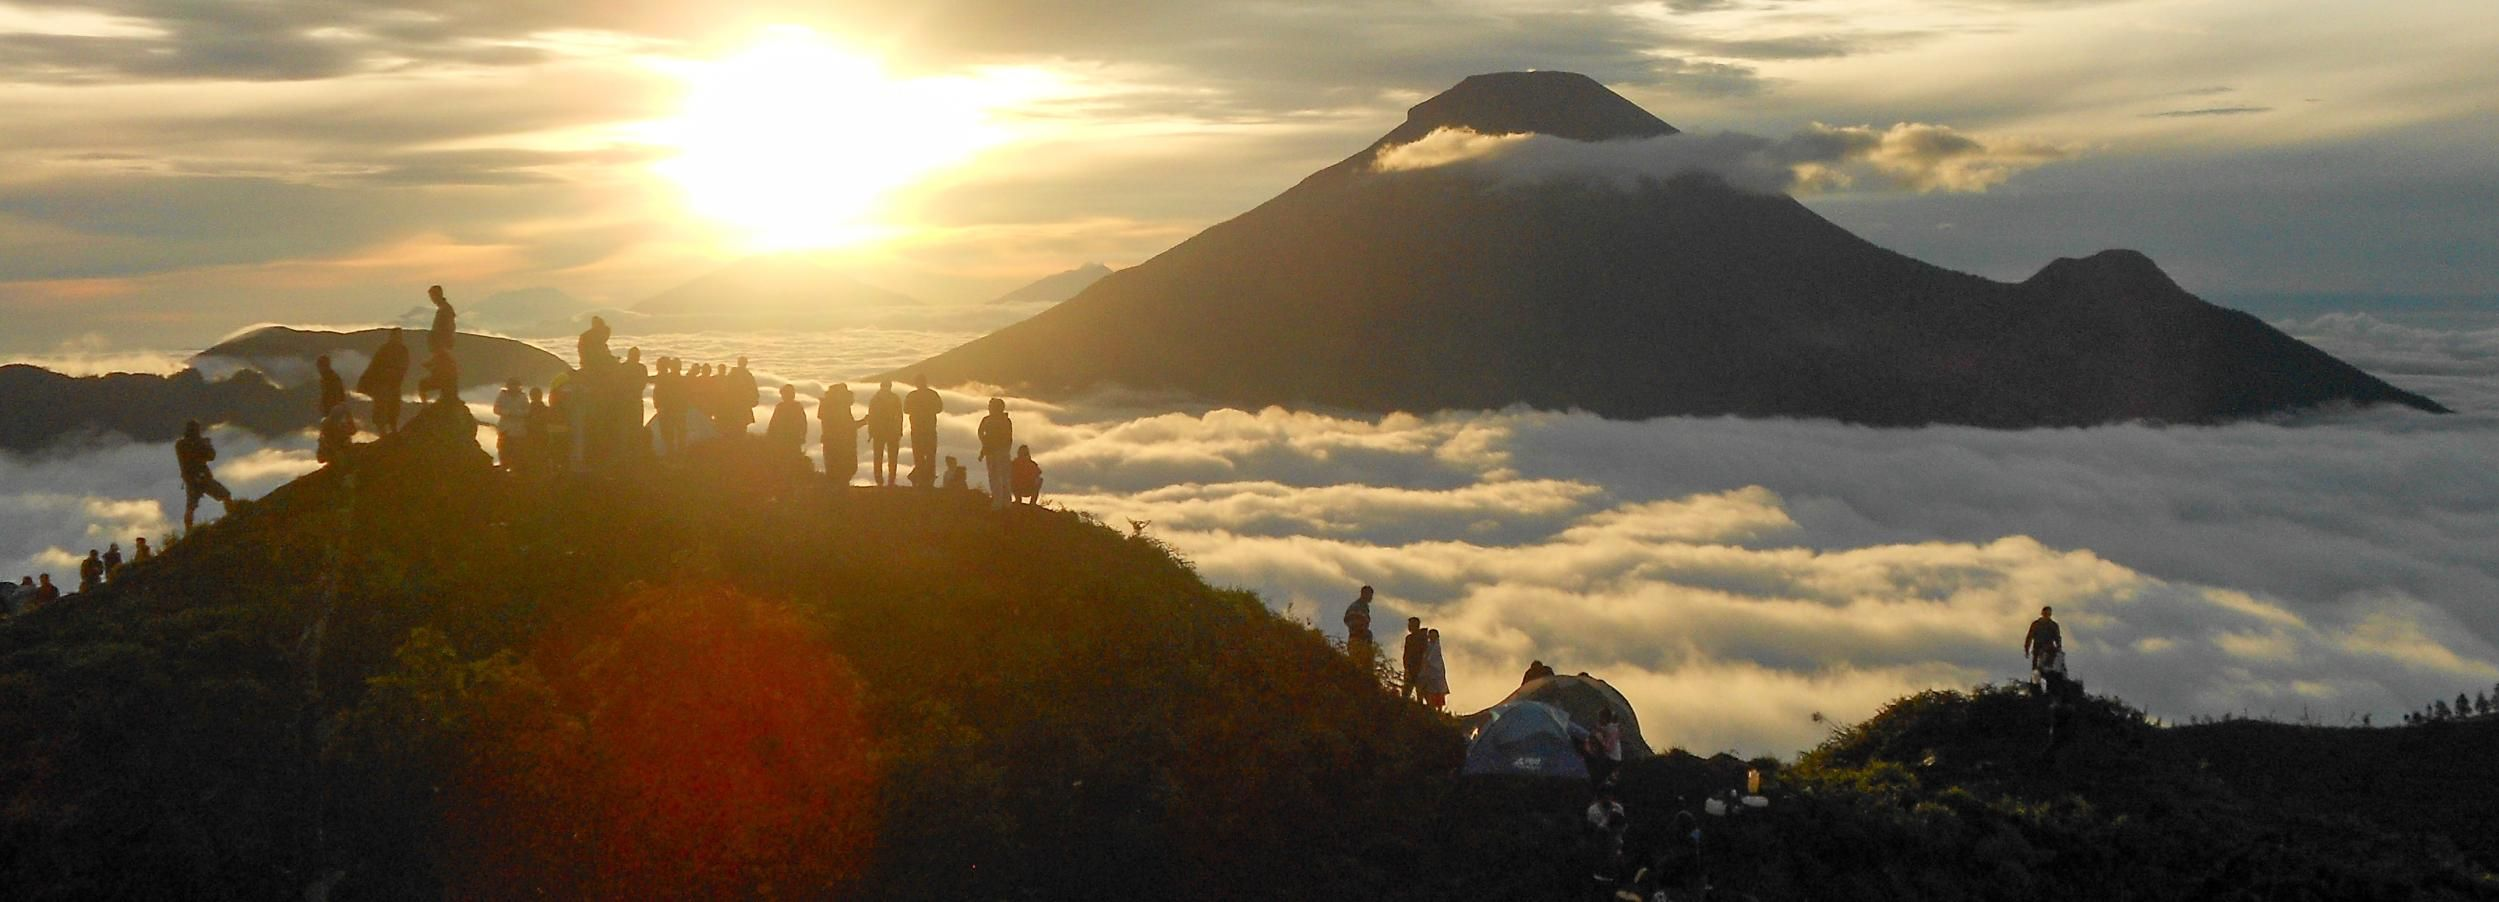 From Yogyakarta: Dieng Plateau Golden Sunrise Trip